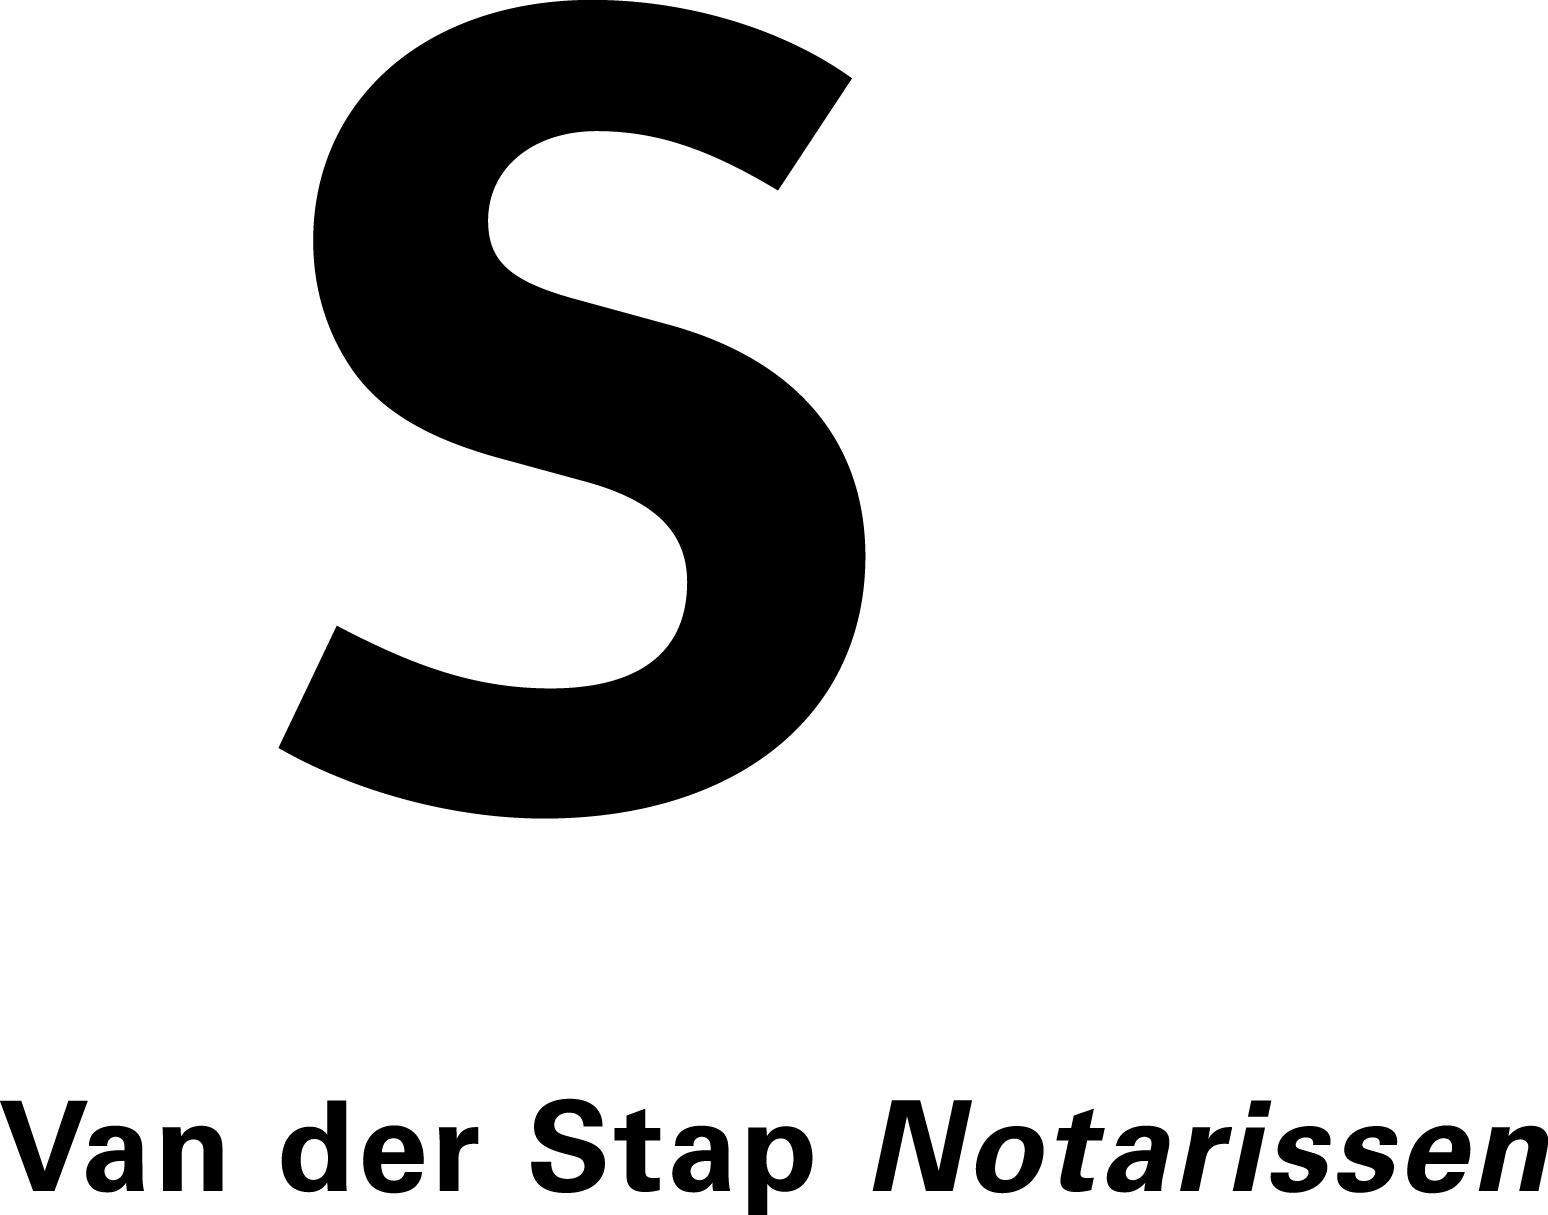 Van der Stap Notarissen